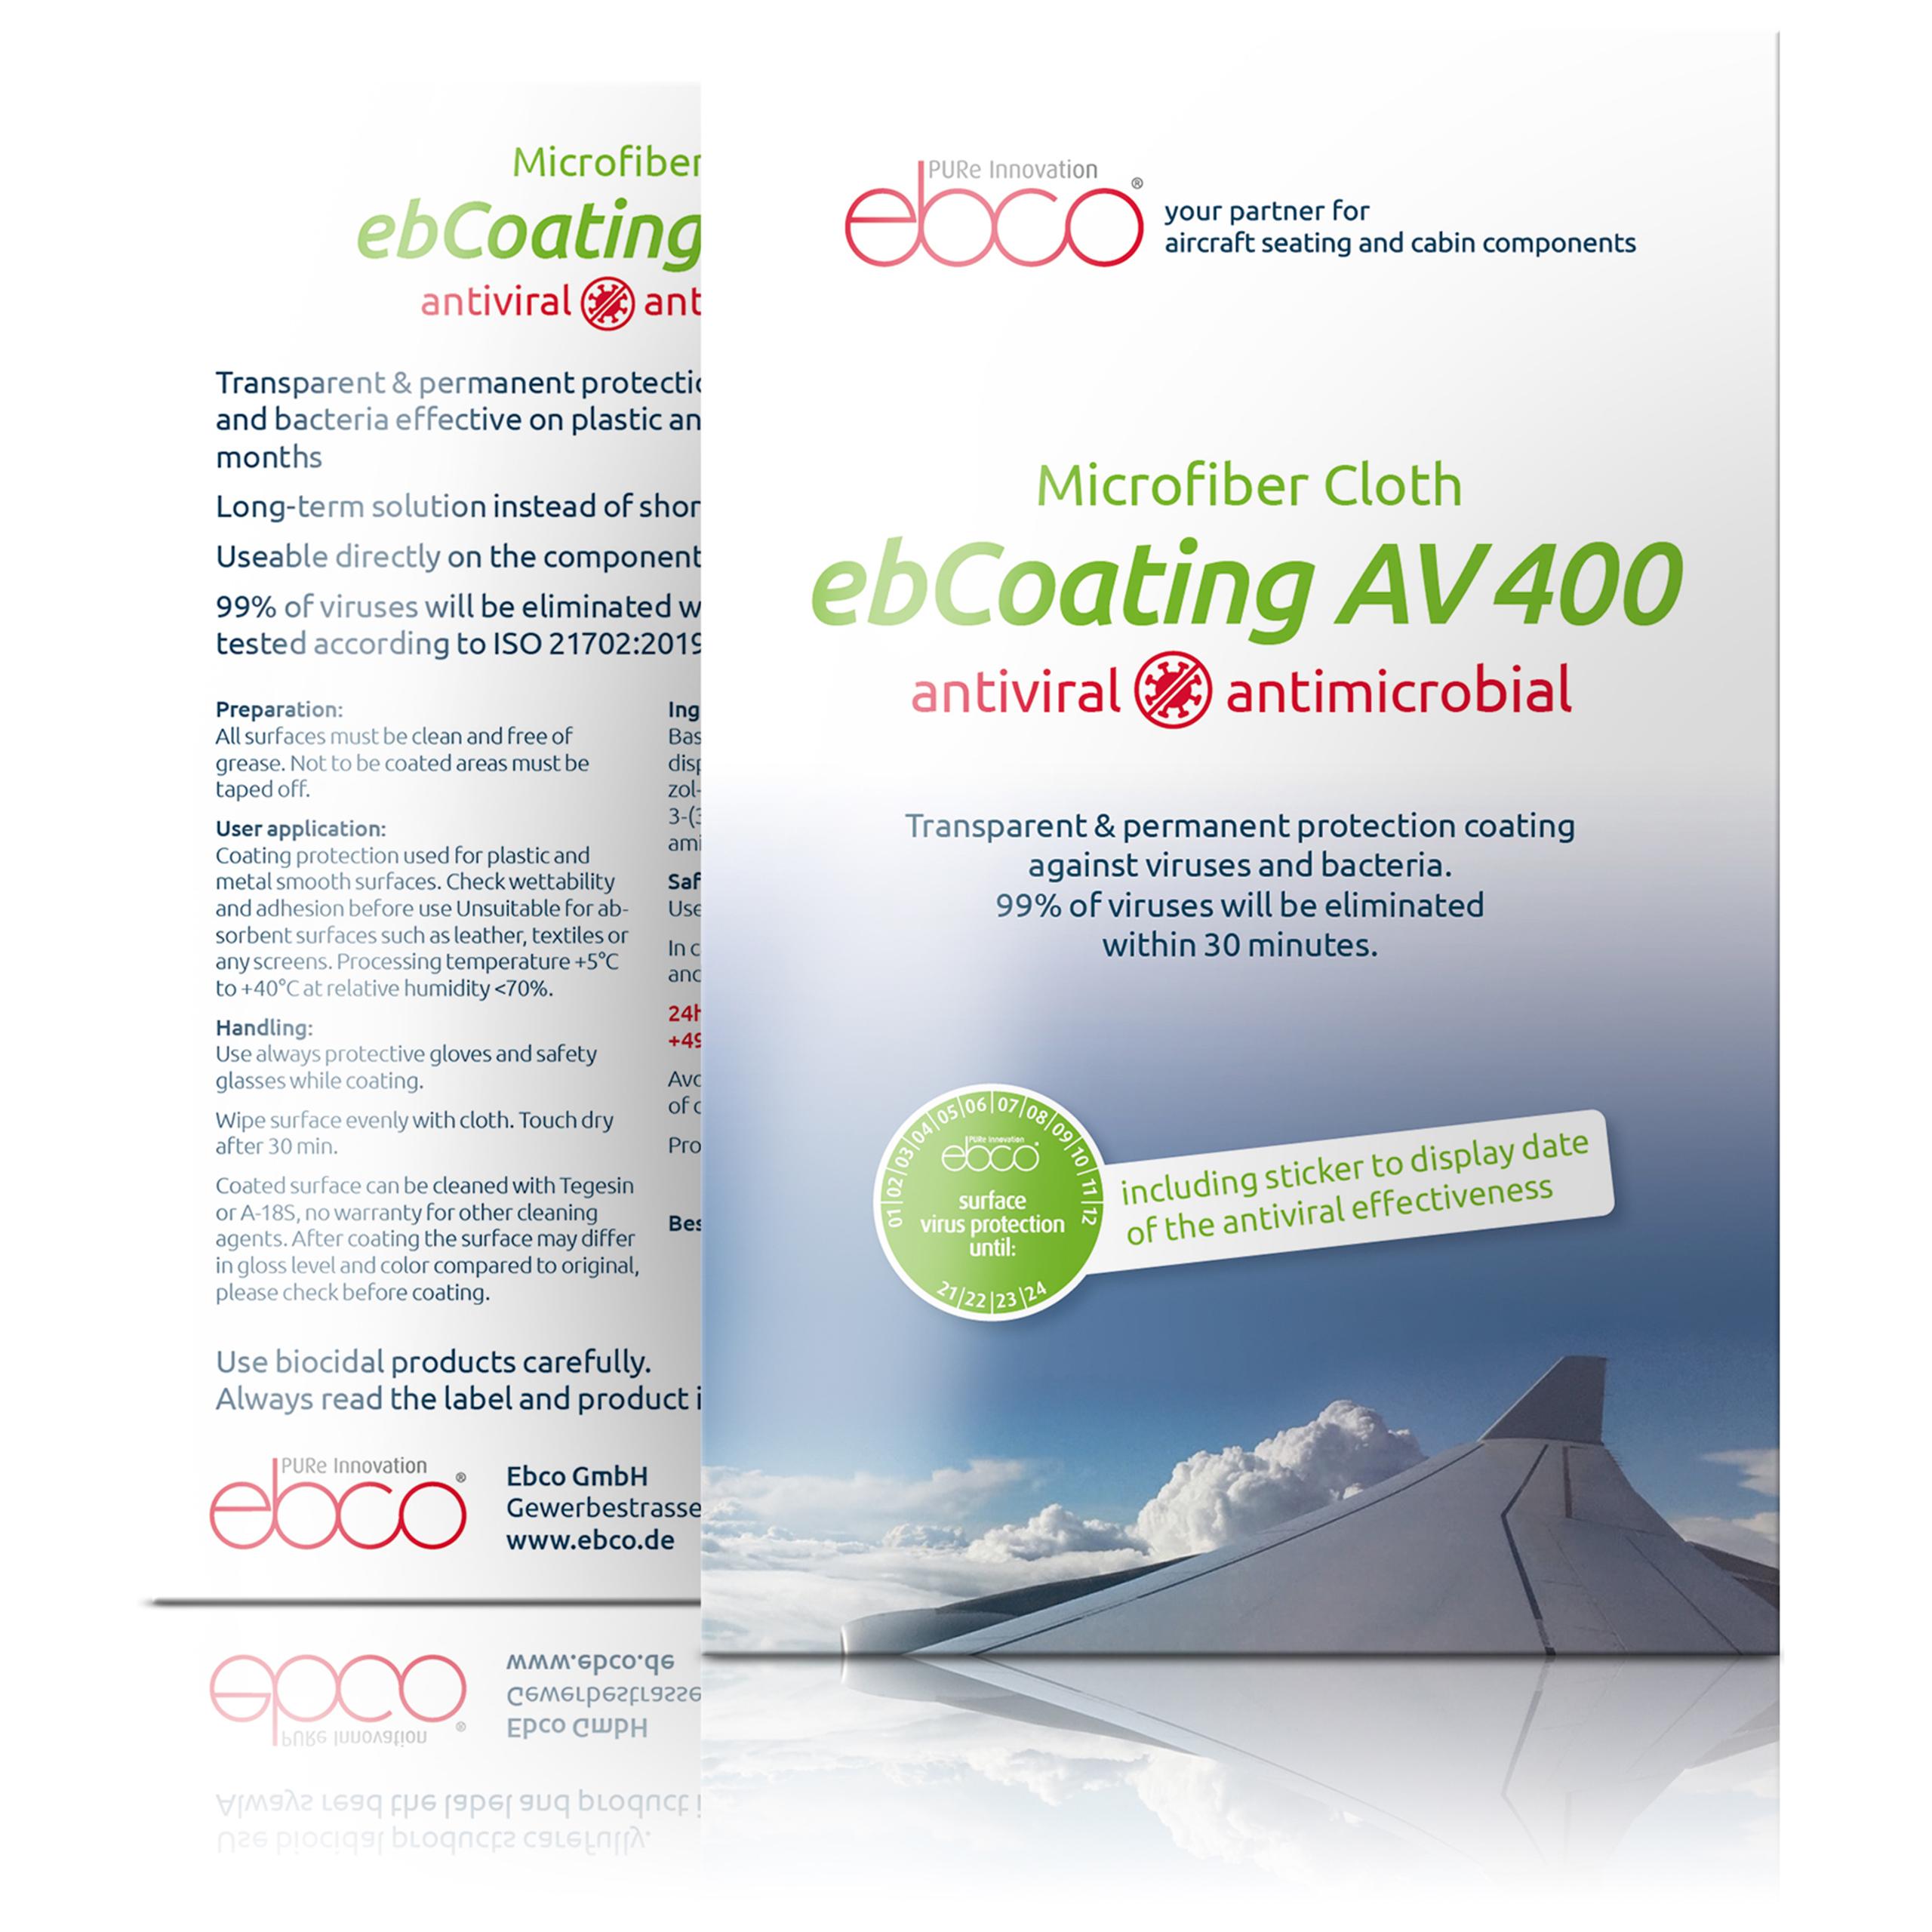 antiviral & antimicrobial <br> Microfiber Cloth<br/> ebCoating AV 400